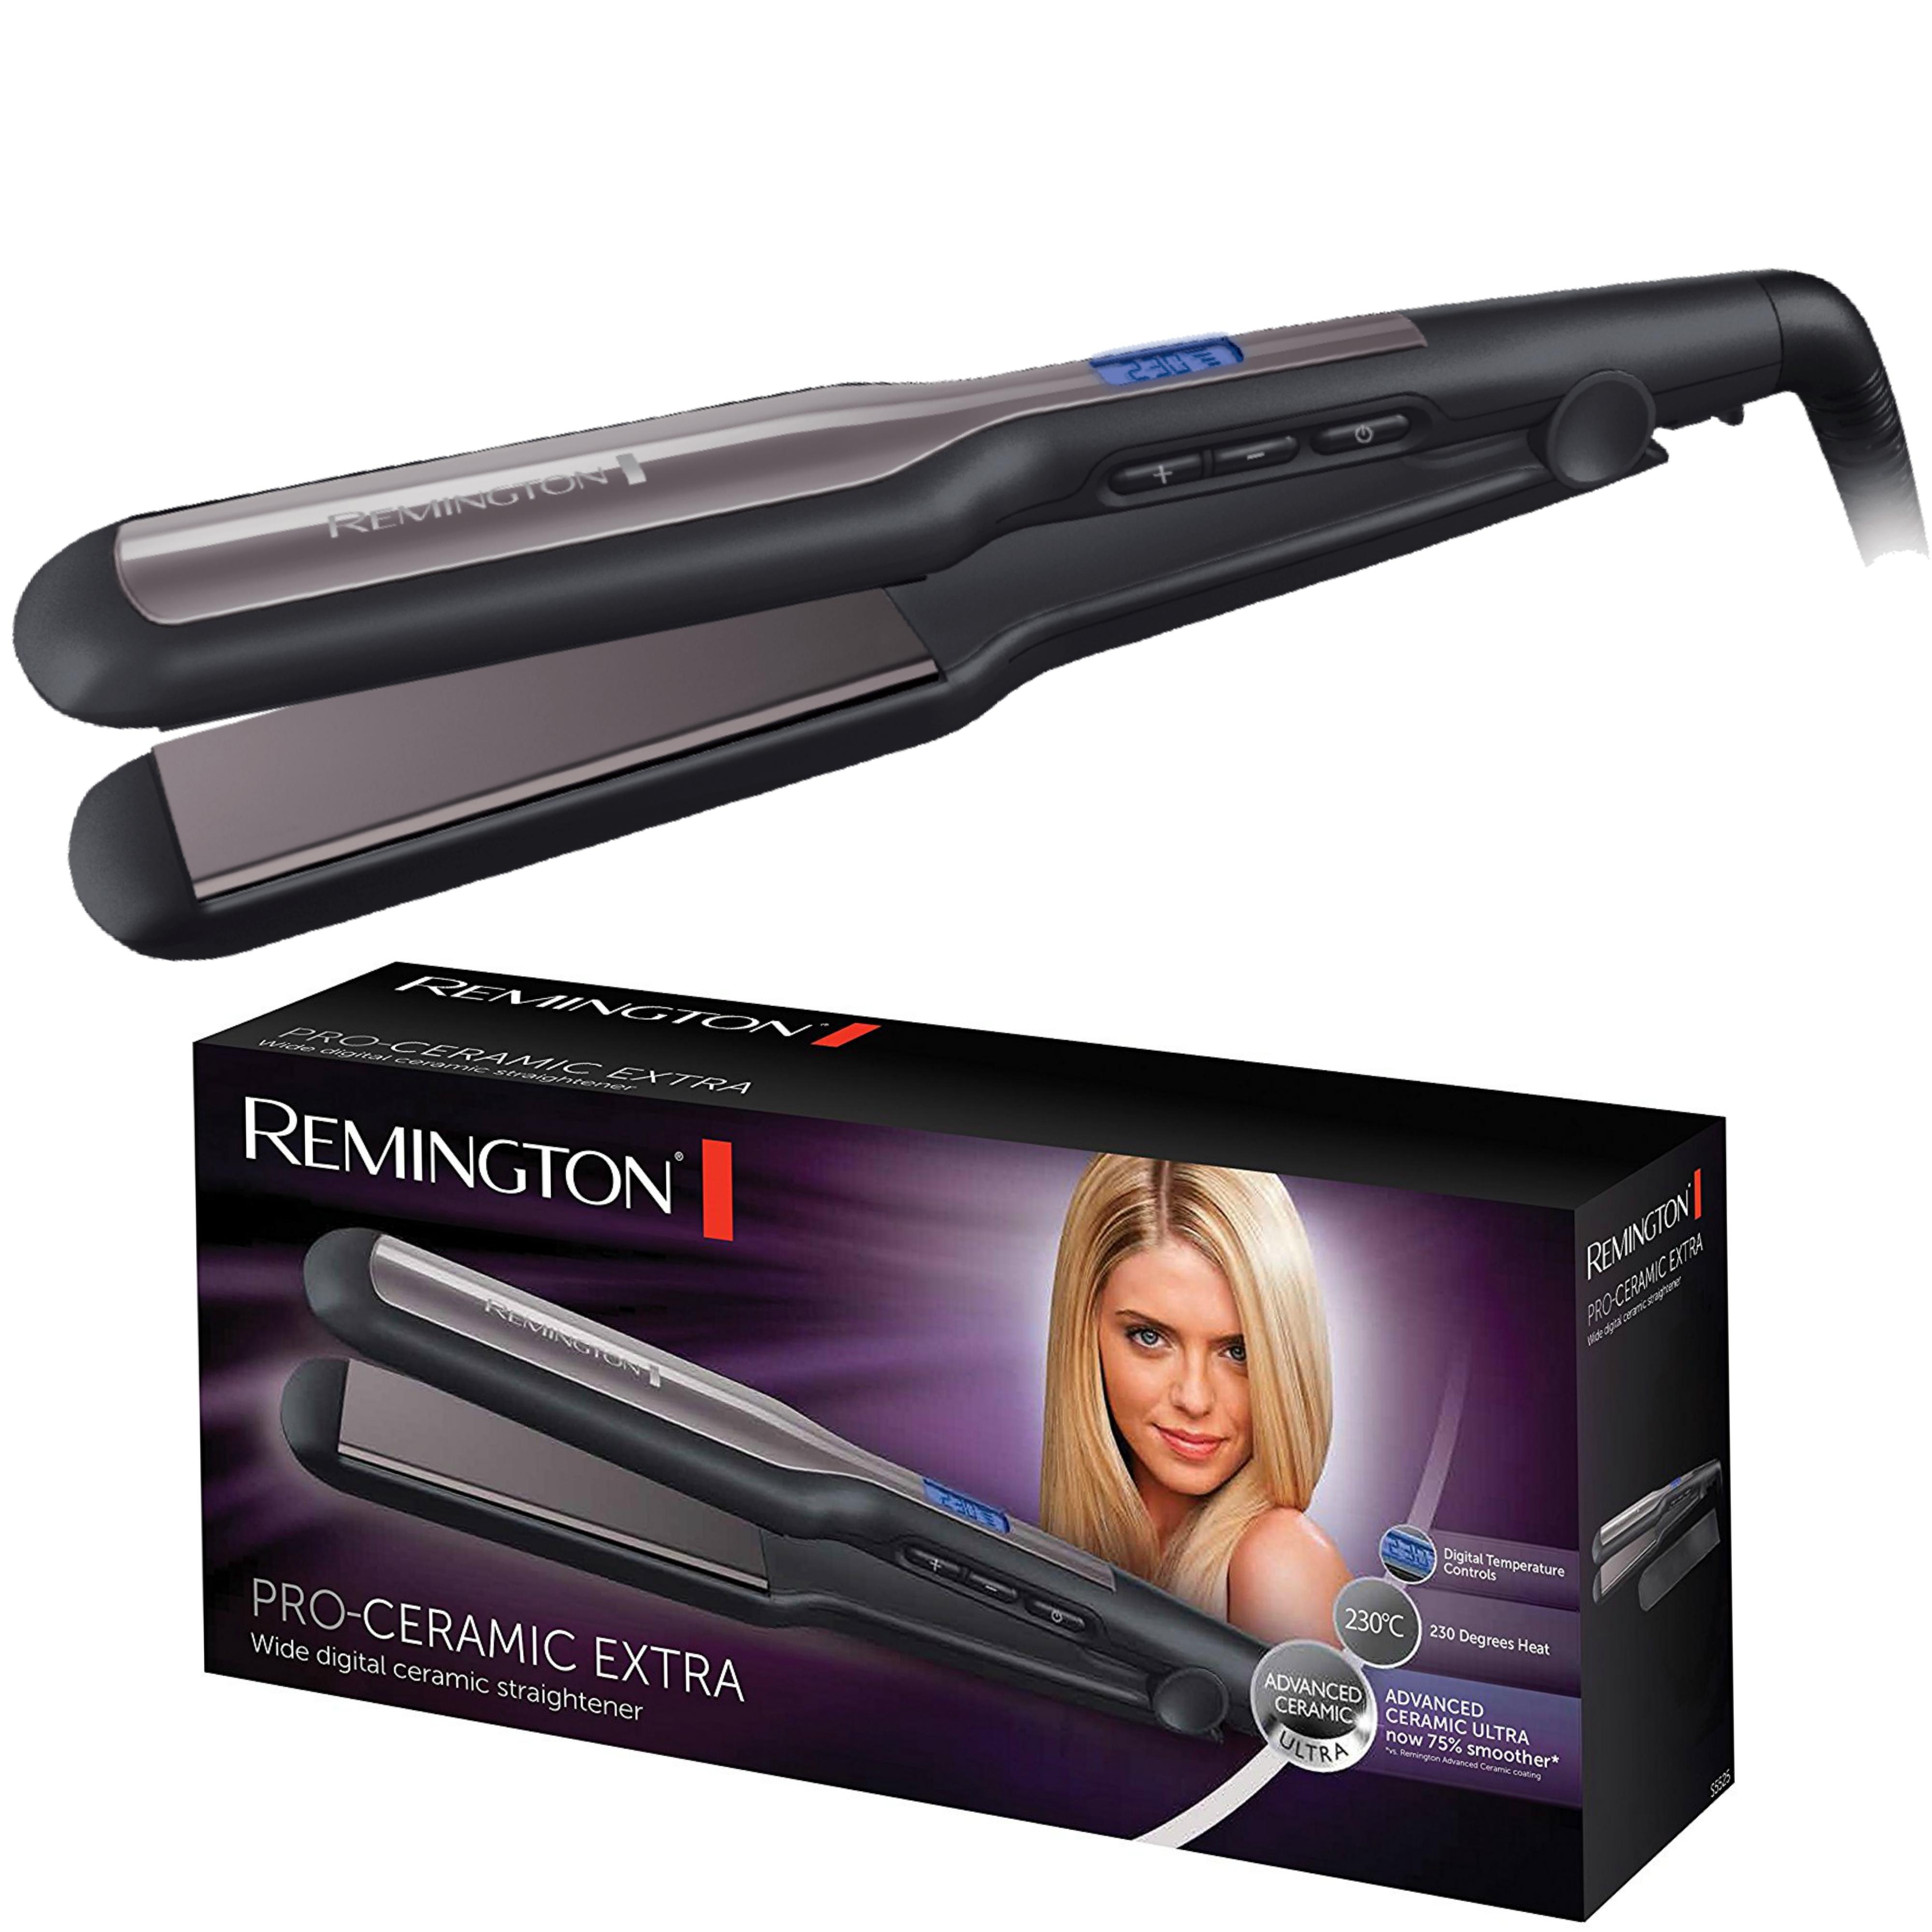 Remington Pro-Ceramic Hair Straightener | Extra Wide Plates | Digital Display | 230ºC